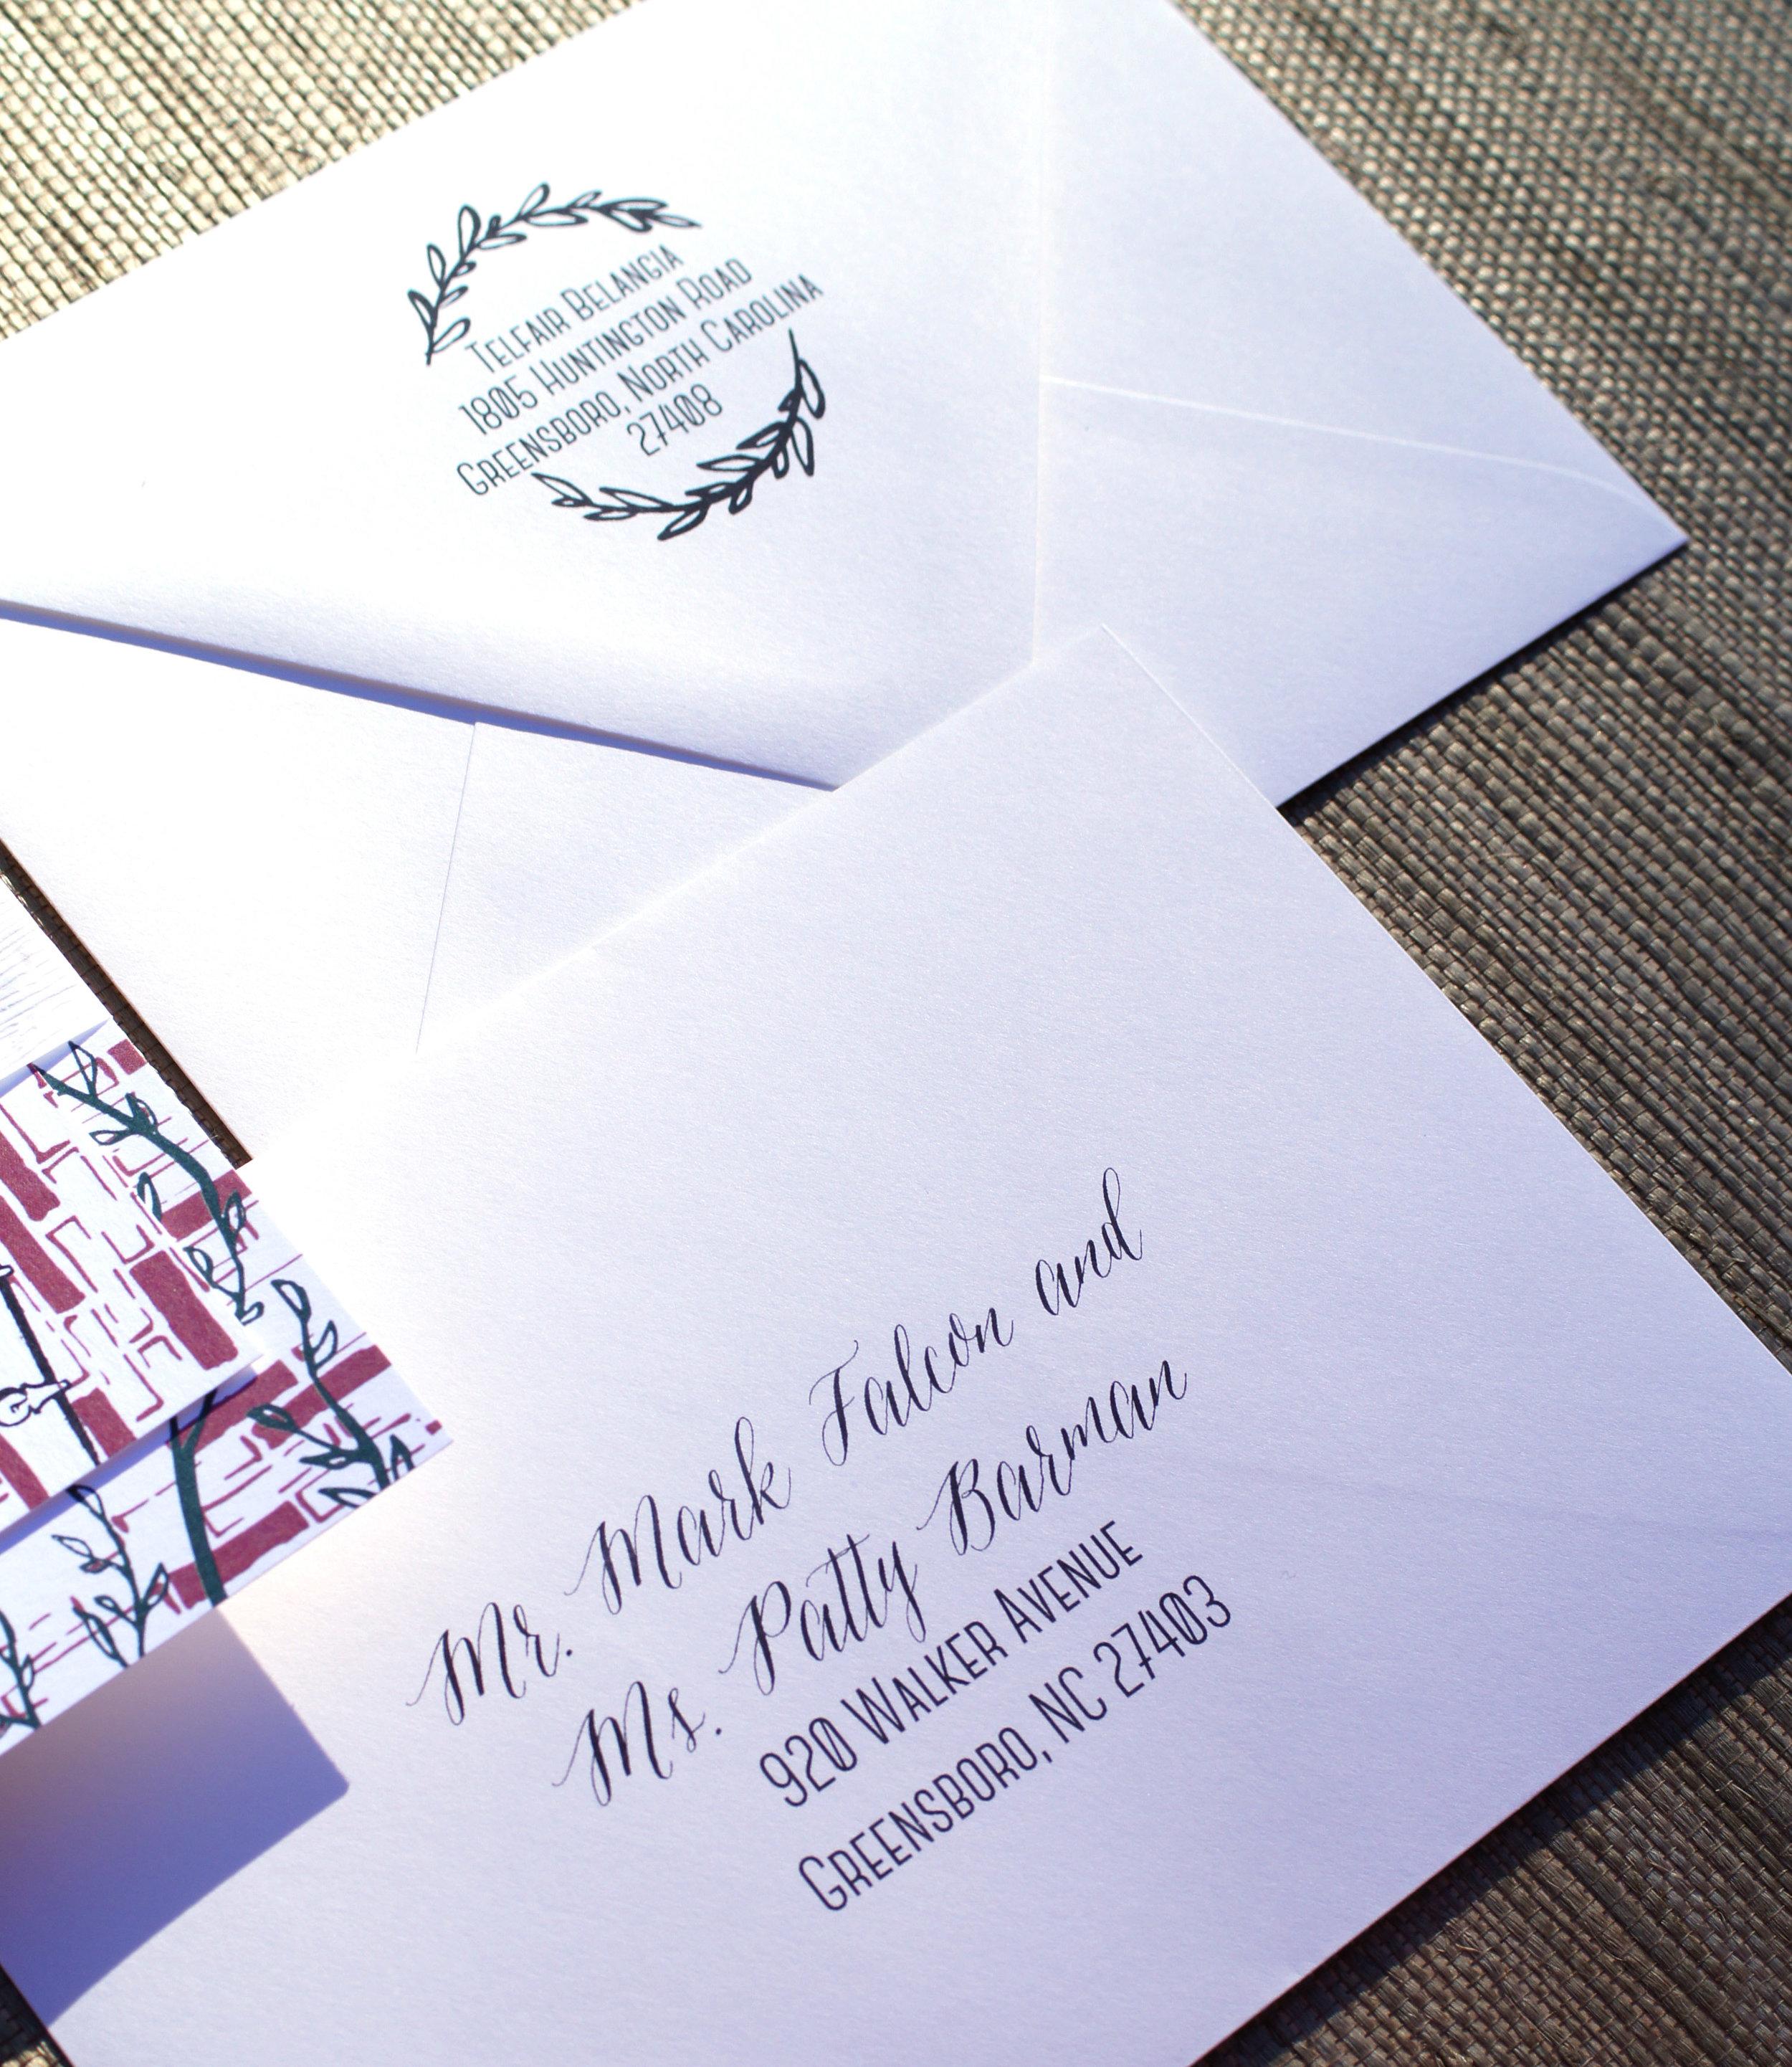 Printed Addresses: $3.00